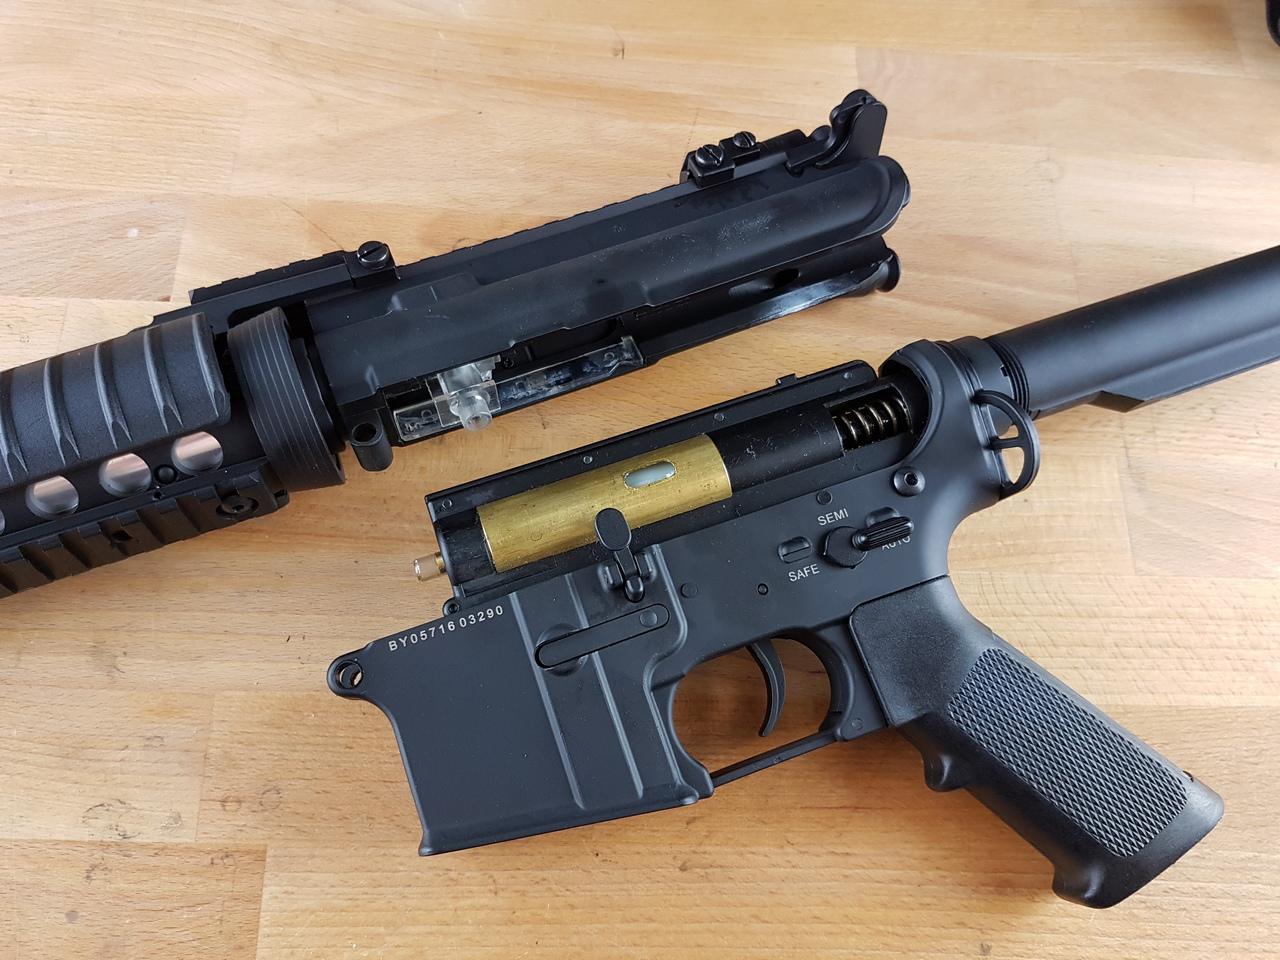 Concept for upgrade study – Dboys M4 + RetroArms split